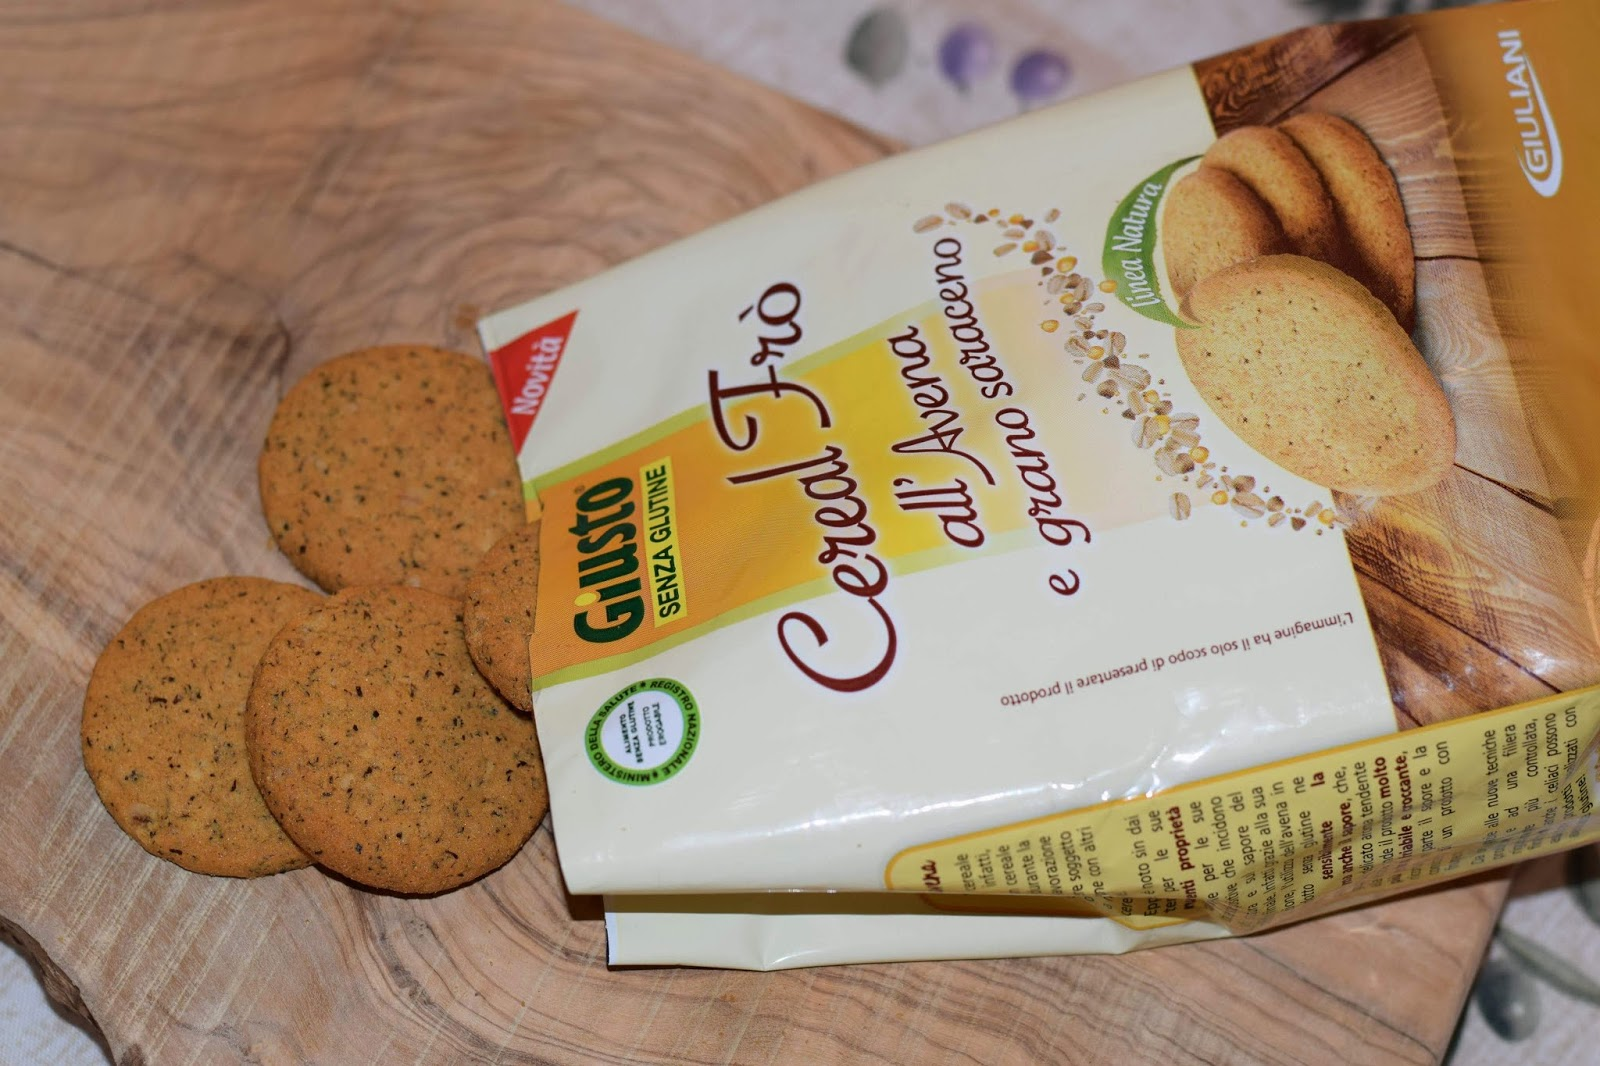 dieta senza glutine biscotti